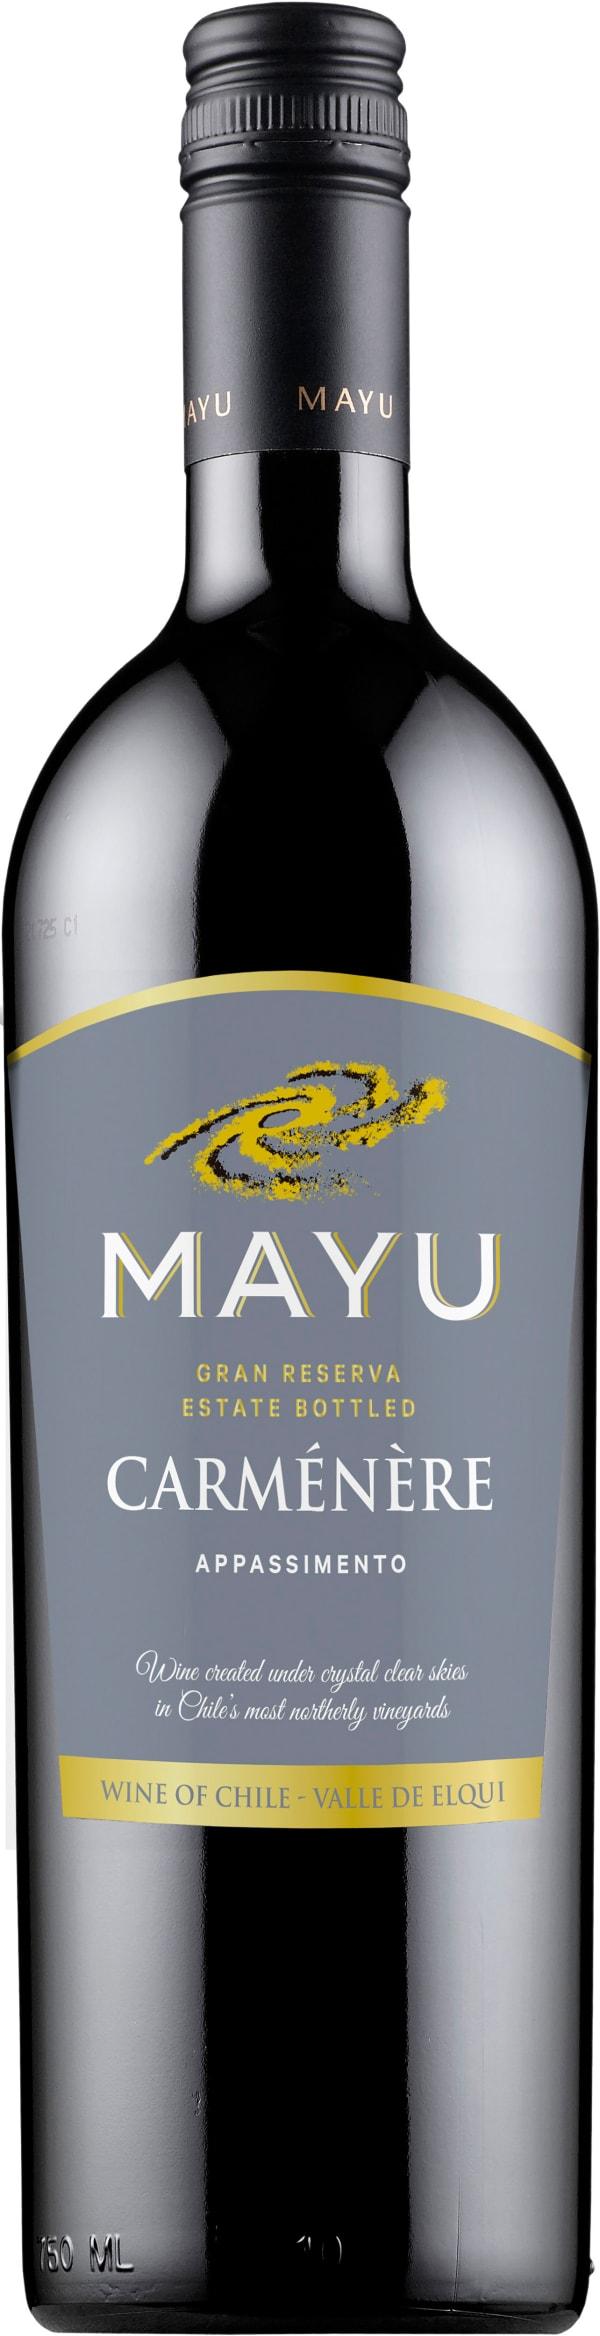 Mayu Reserva Carménère 2015